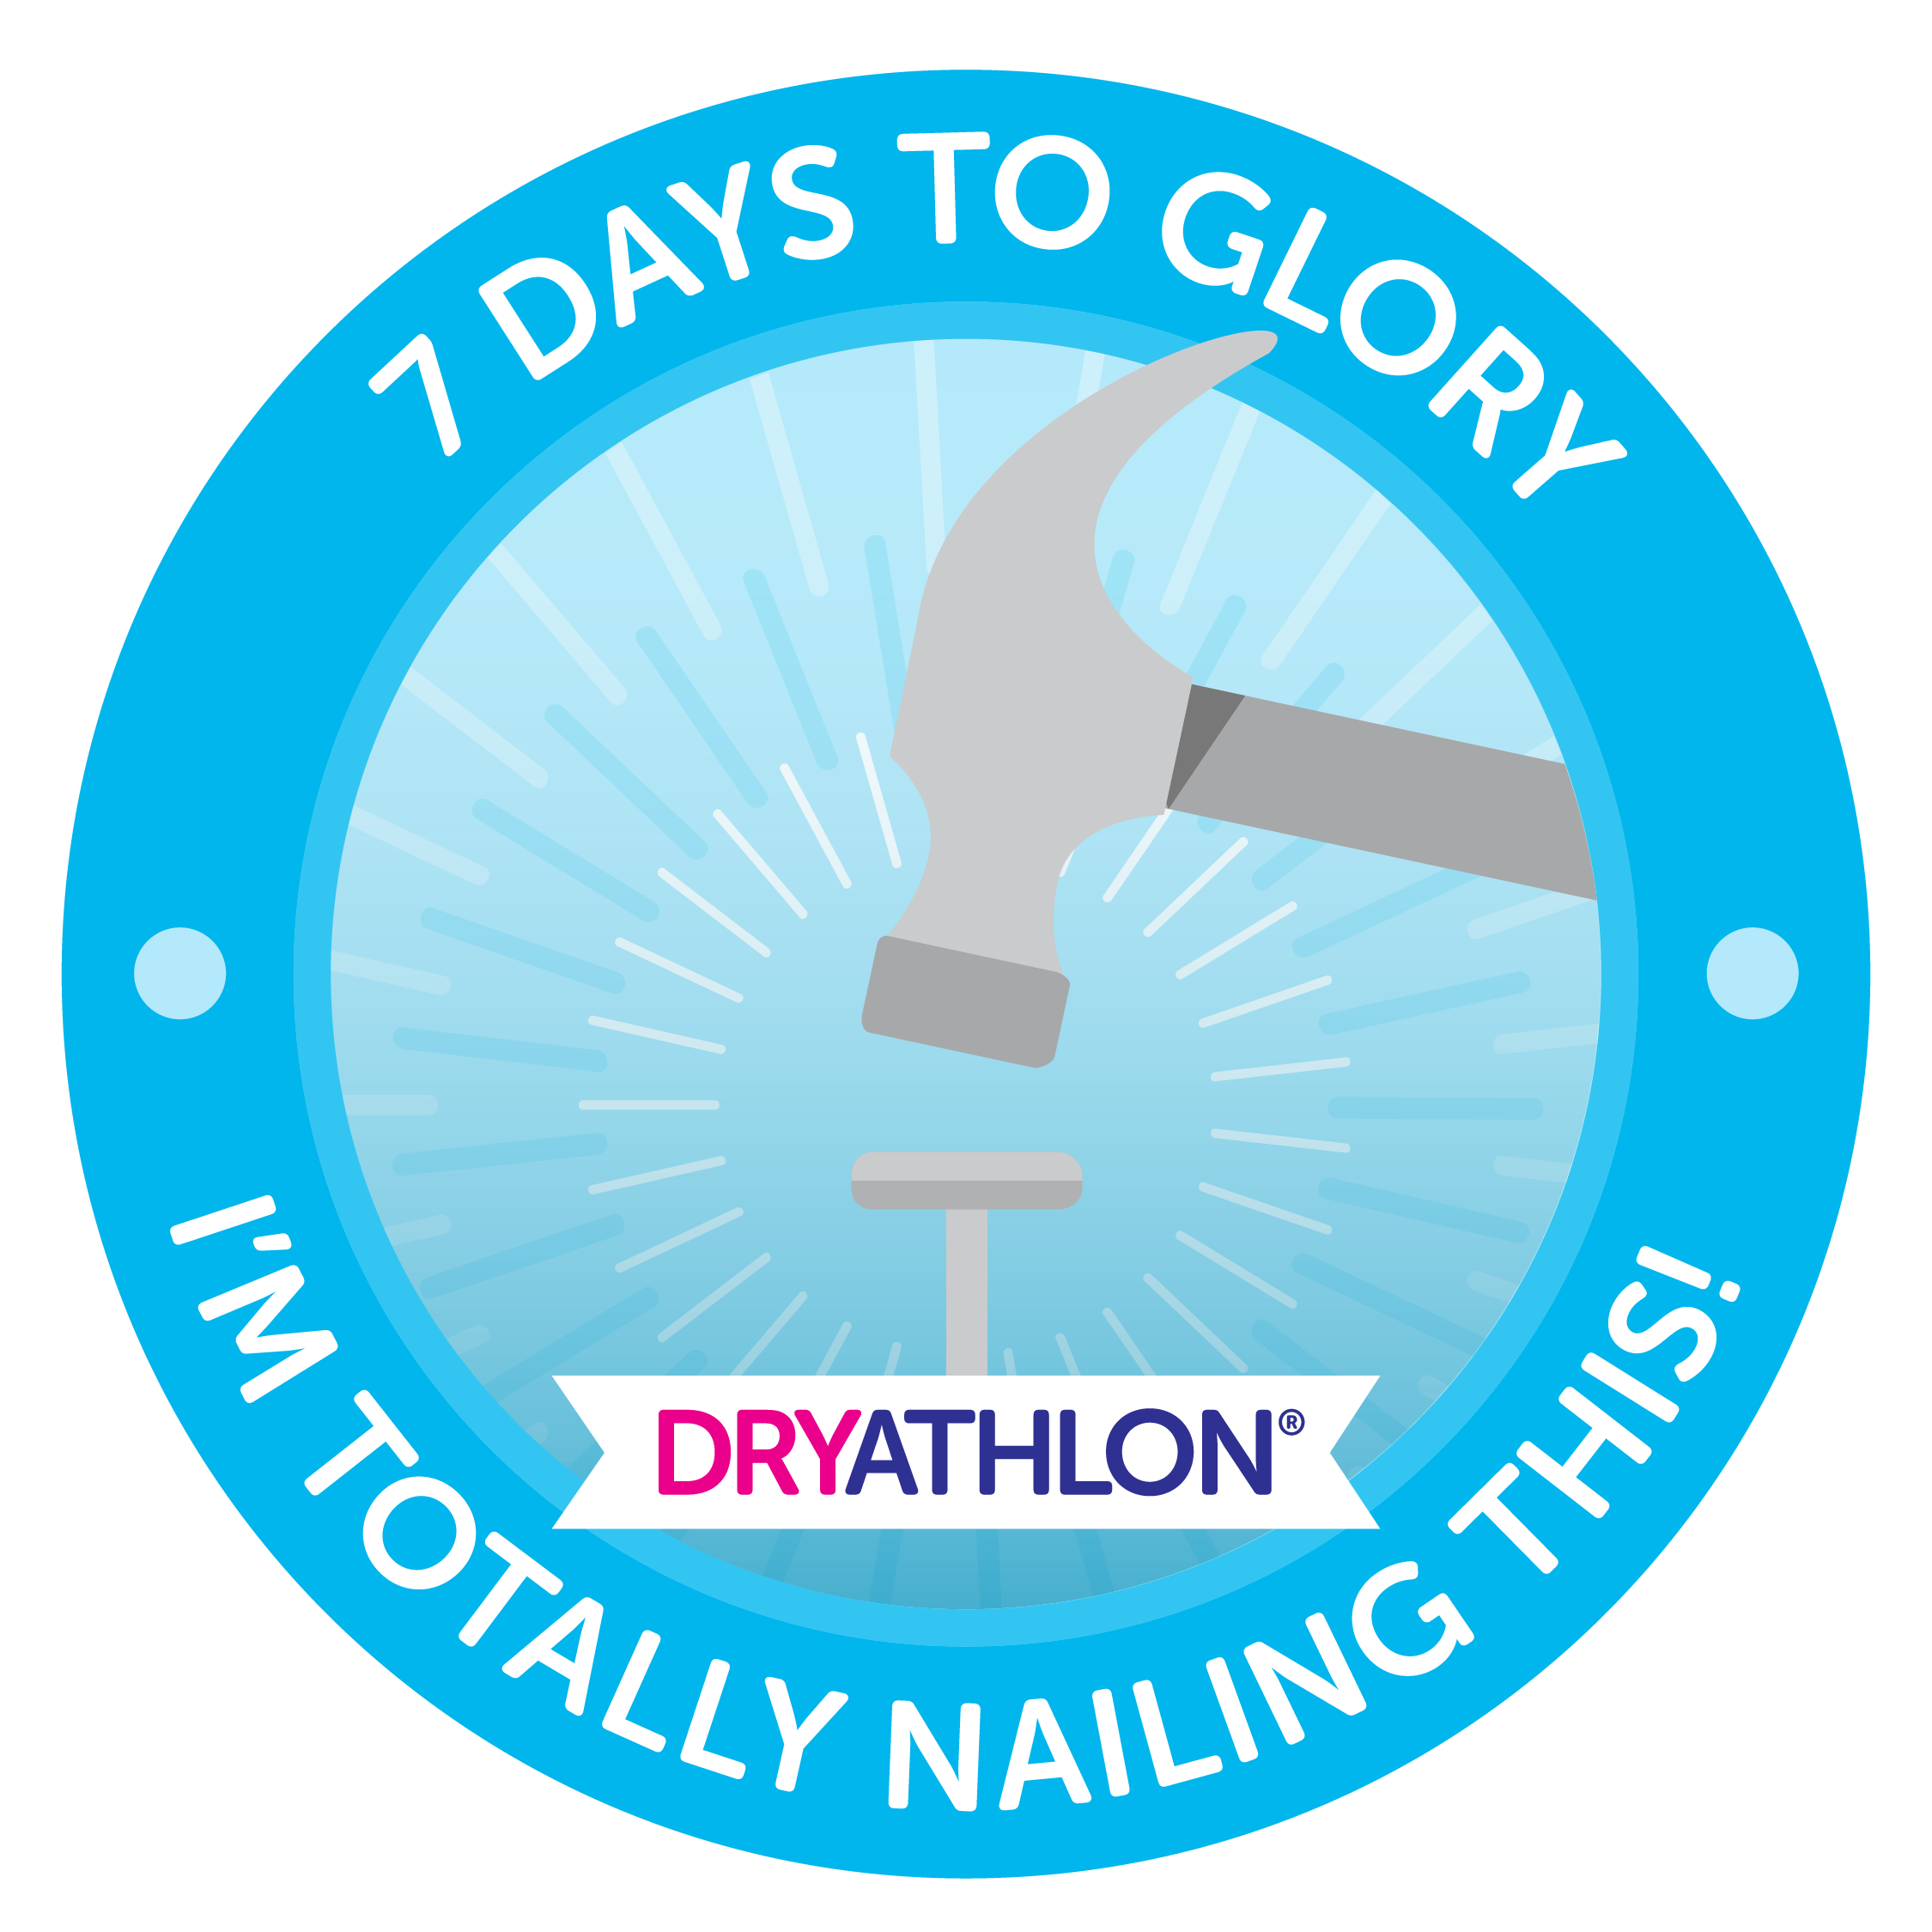 7 days to glory badge